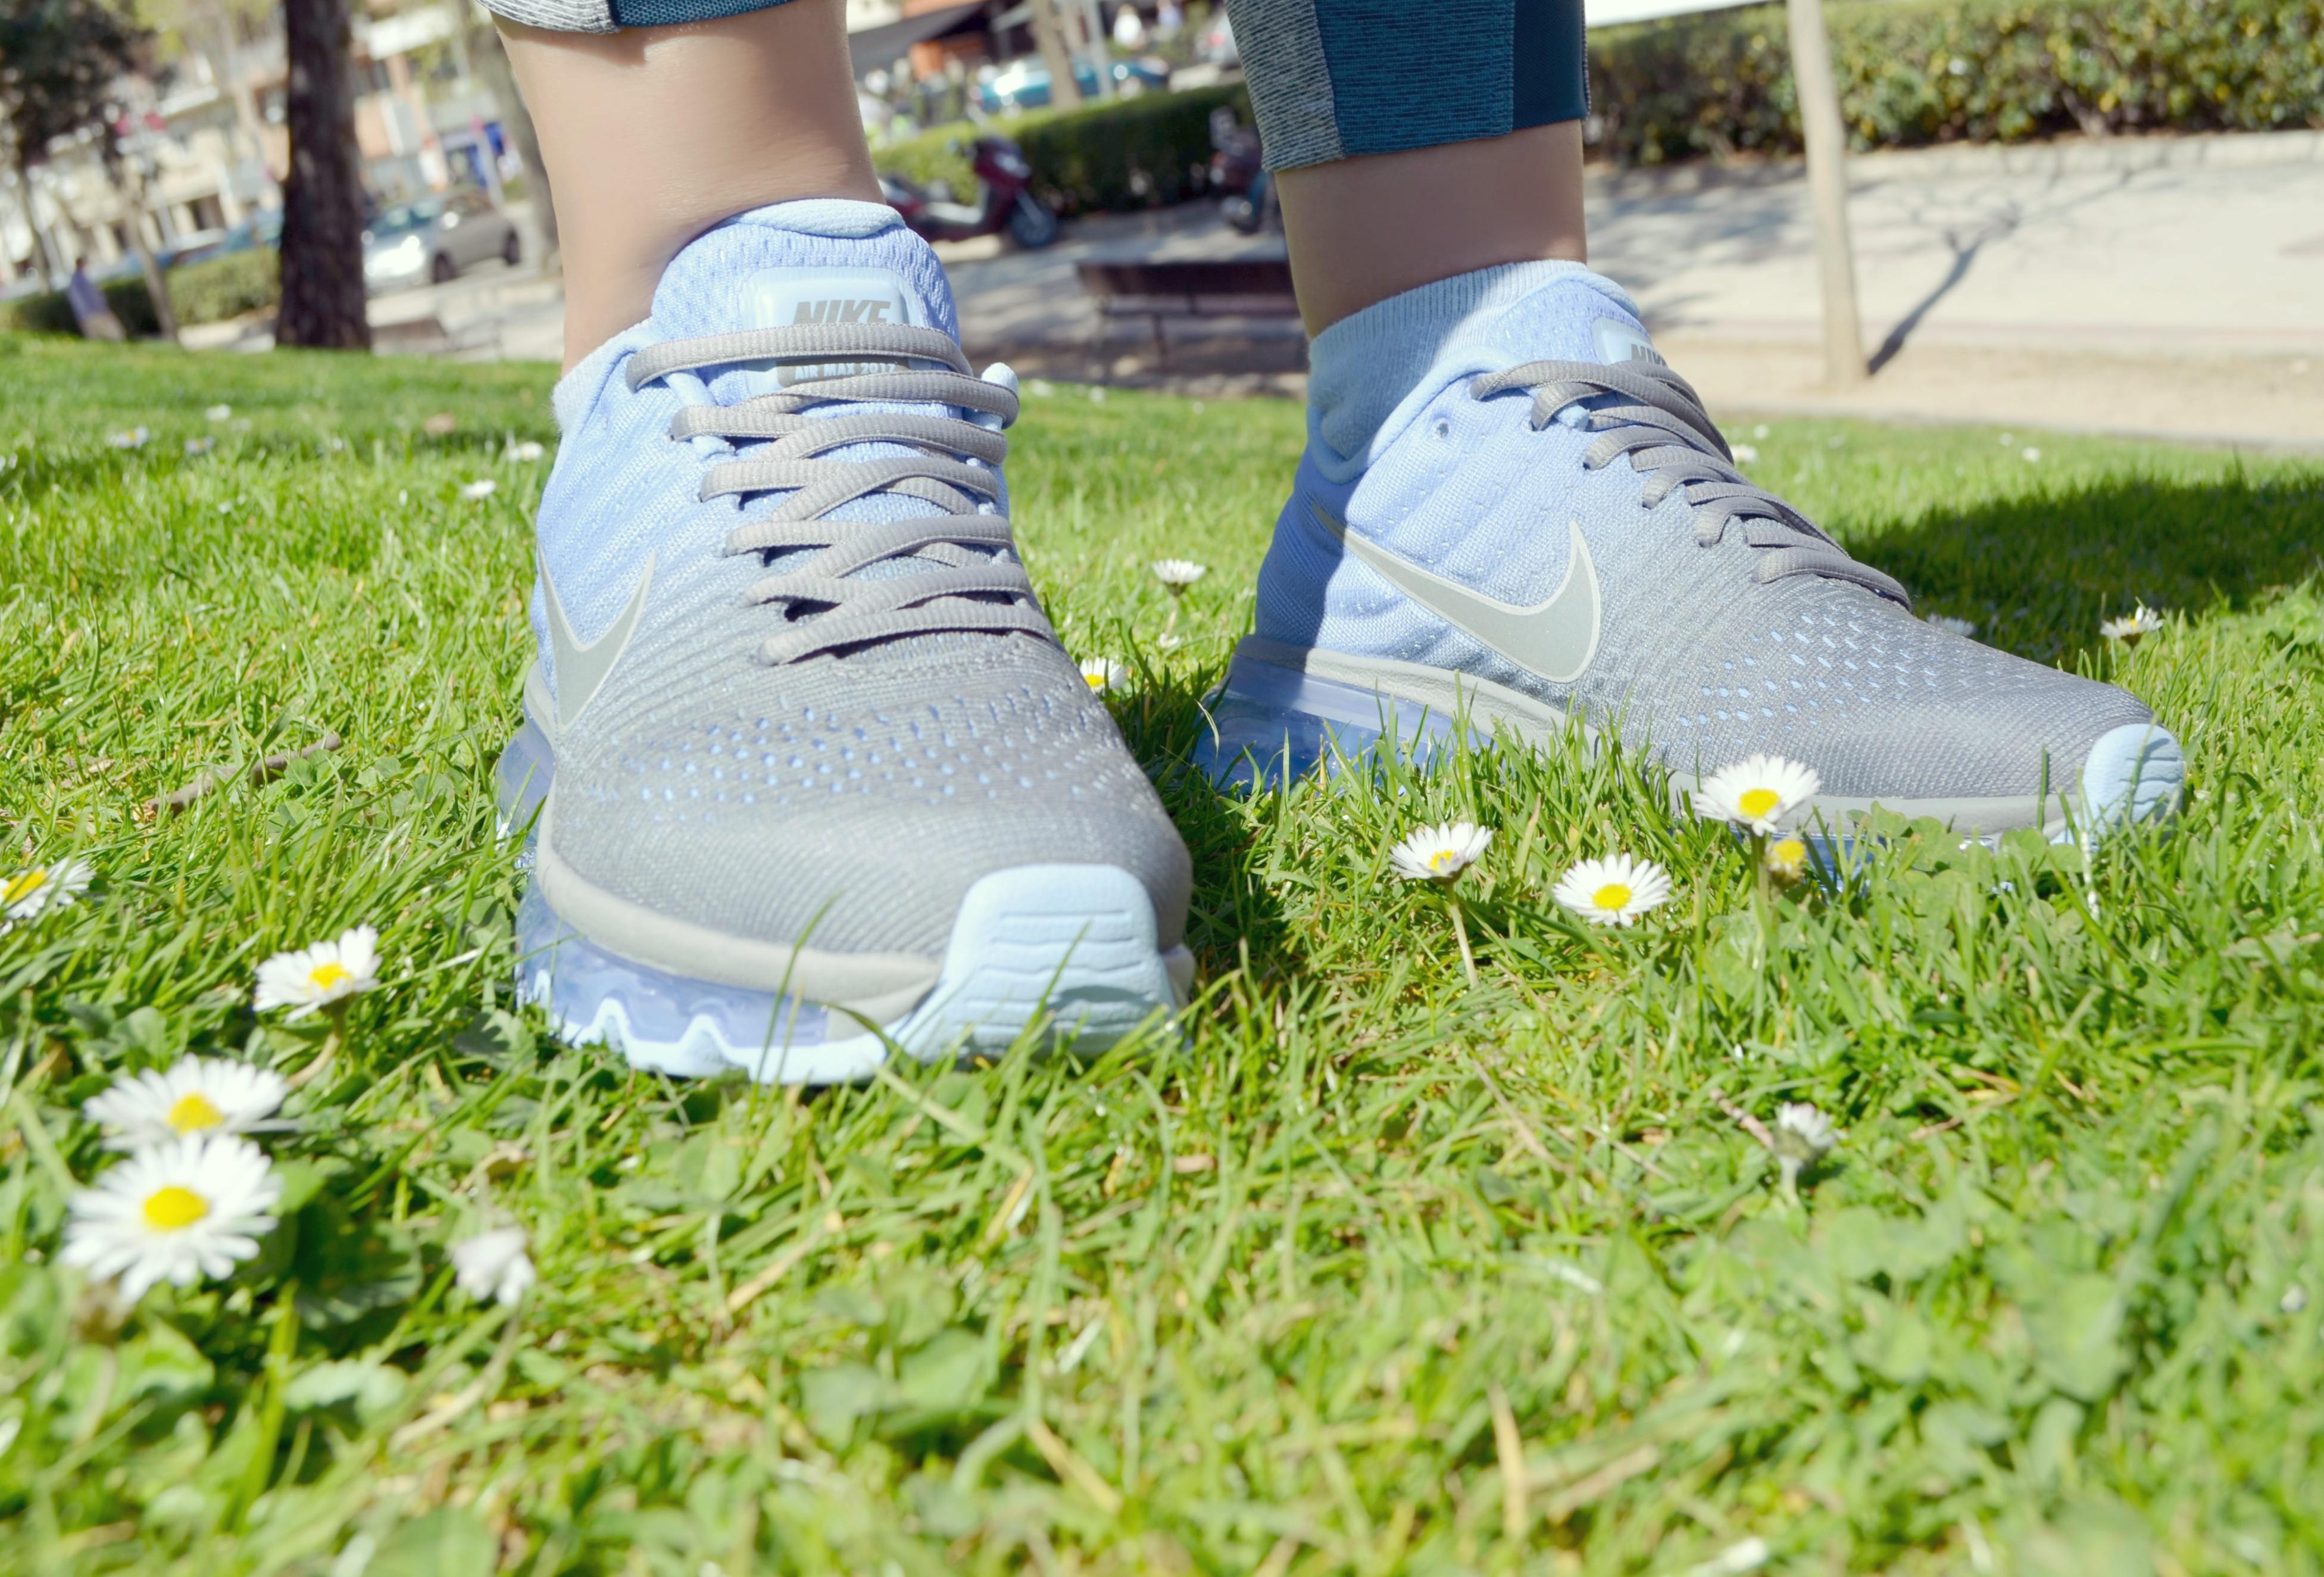 Nike-Air-Max-2017-blog-de-moda-zapatillas-JD-Sports-Espana-ChicAdicta-fitness-look-Chic-Adicta-blue-sneackers-PiensaenChic-Piensa-en-Chic